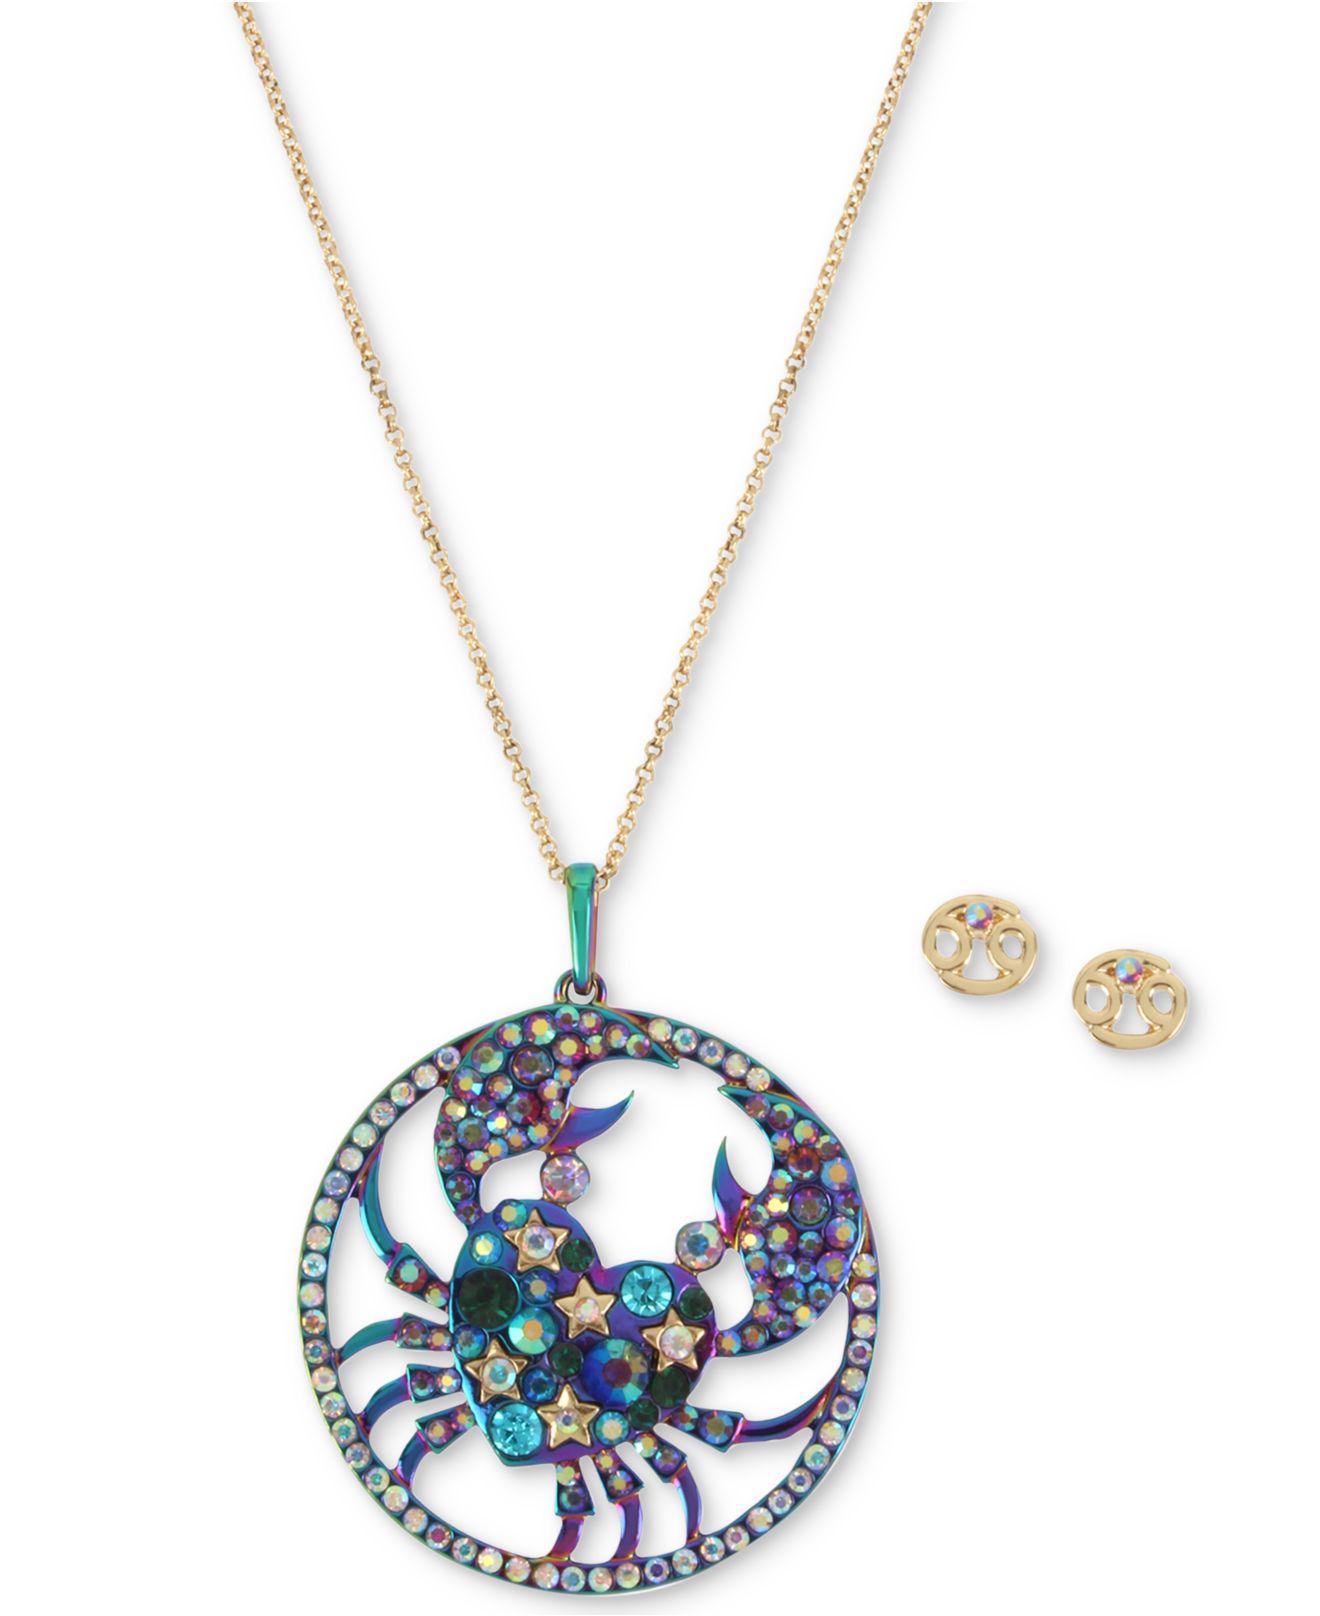 Lyst betsey johnson two tone multi stone cancer zodiac pendant cancer zodiac pendant necklace stud view fullscreen aloadofball Gallery